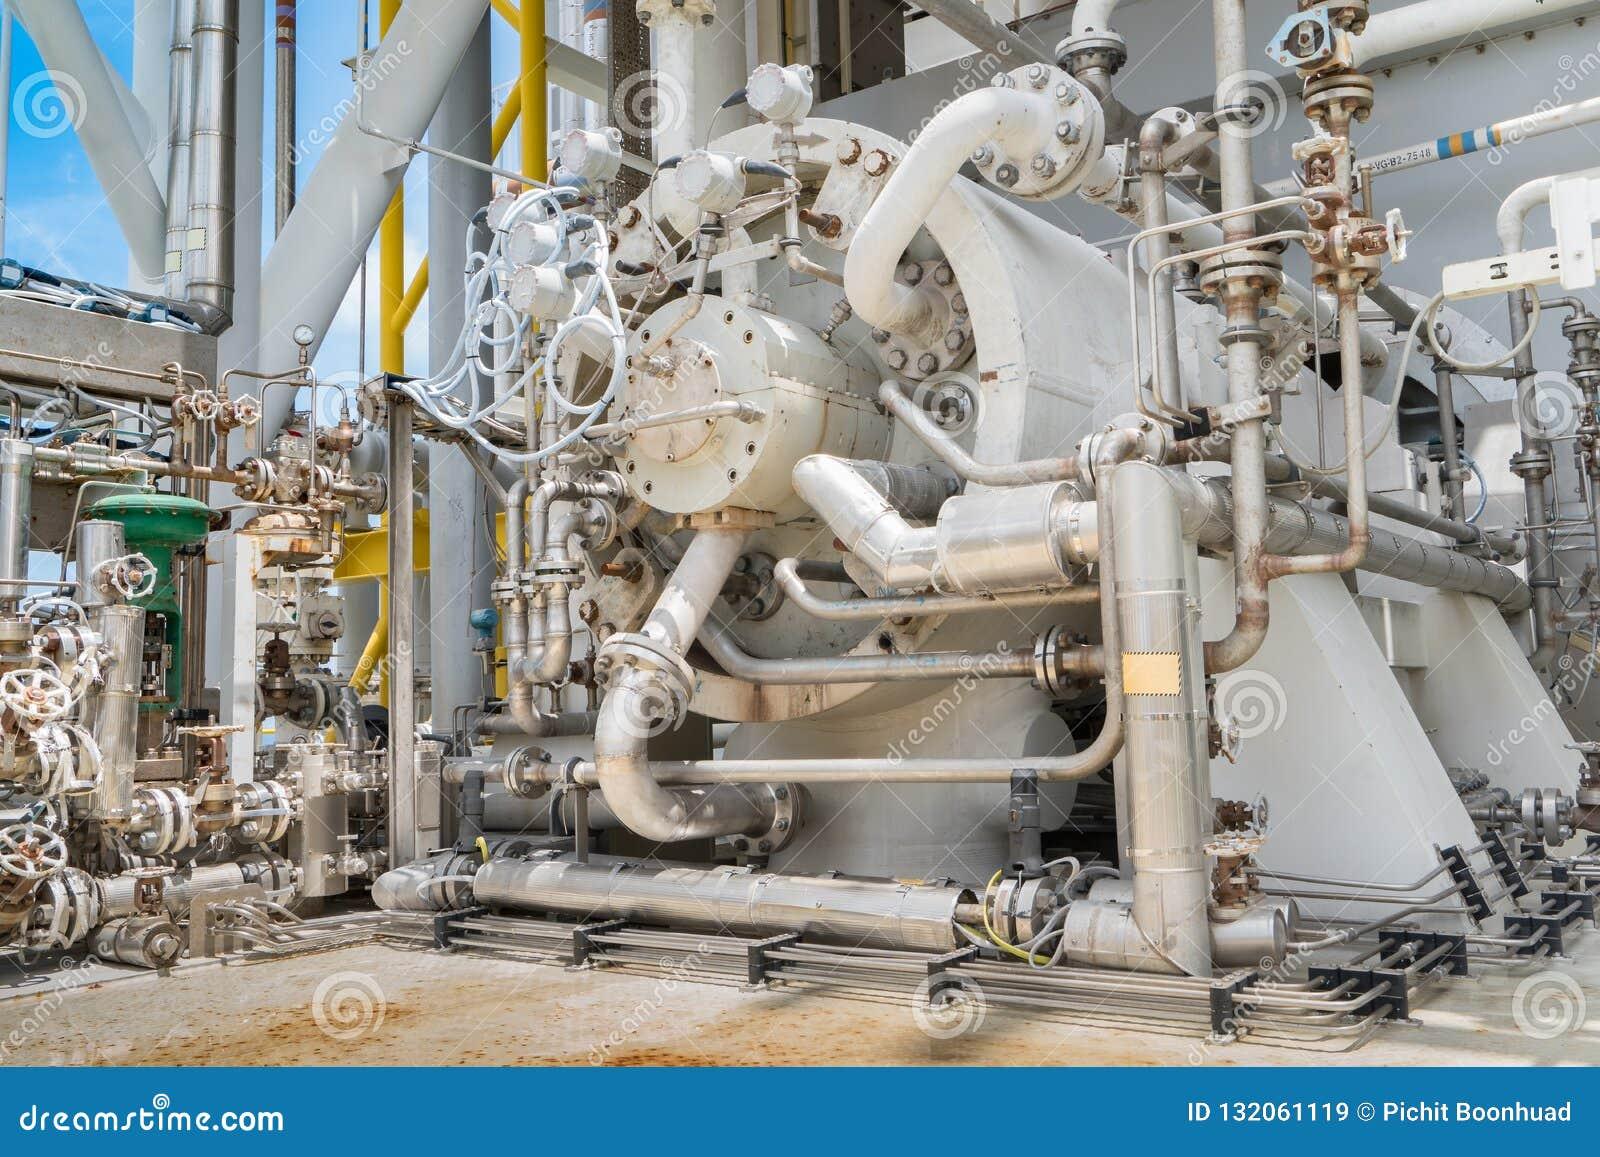 Compressor van de gasturbine, centrifugaal en multistadiumtype